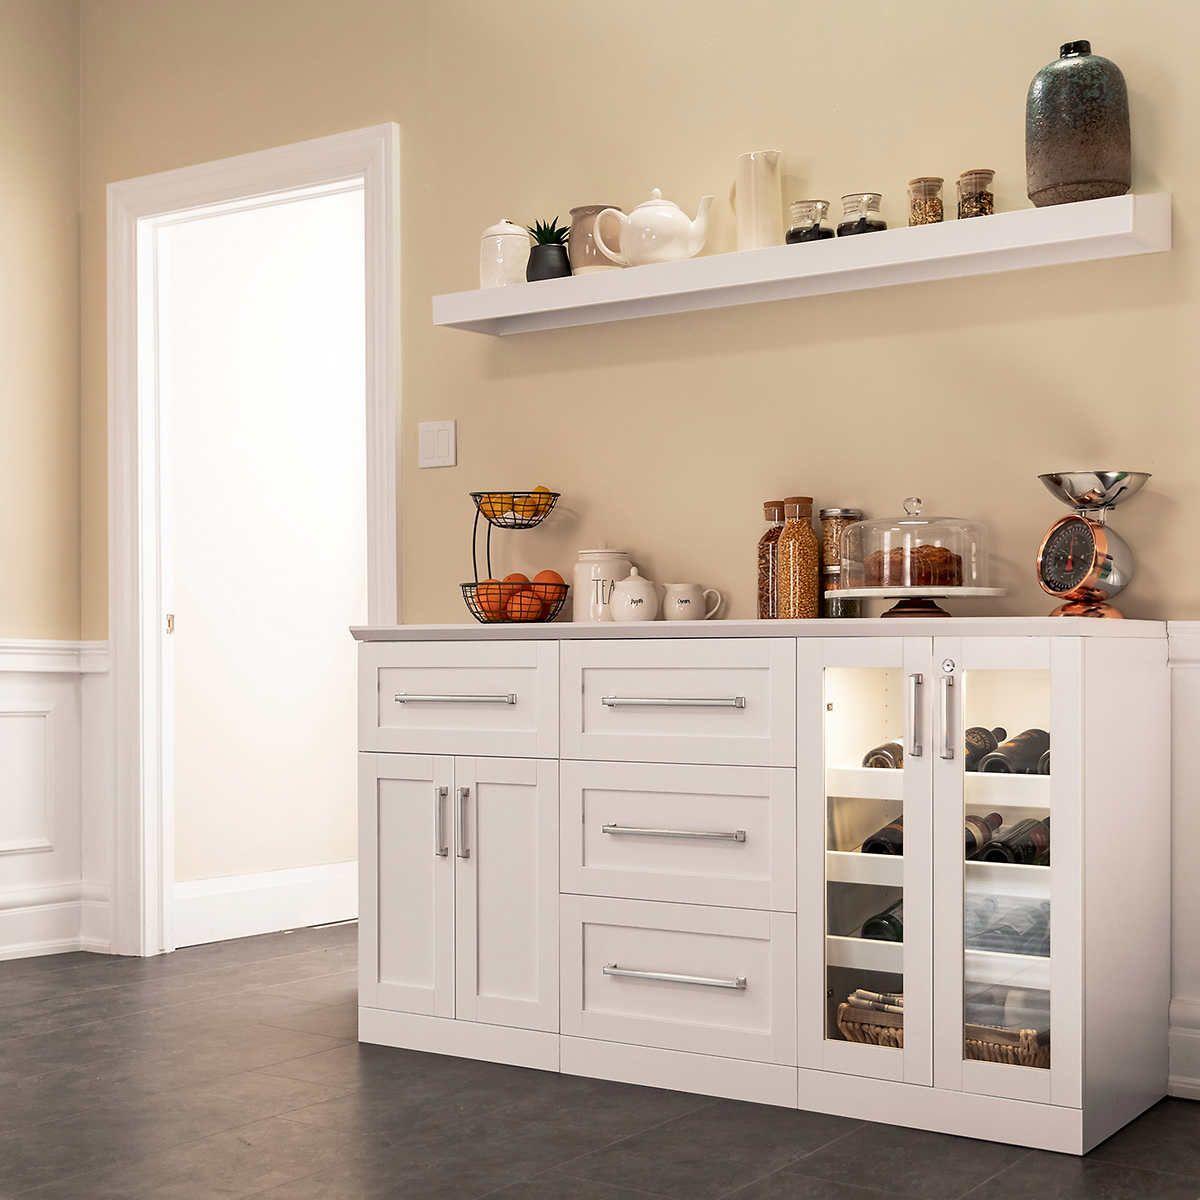 Home wine bar 5piece set with display shelf by